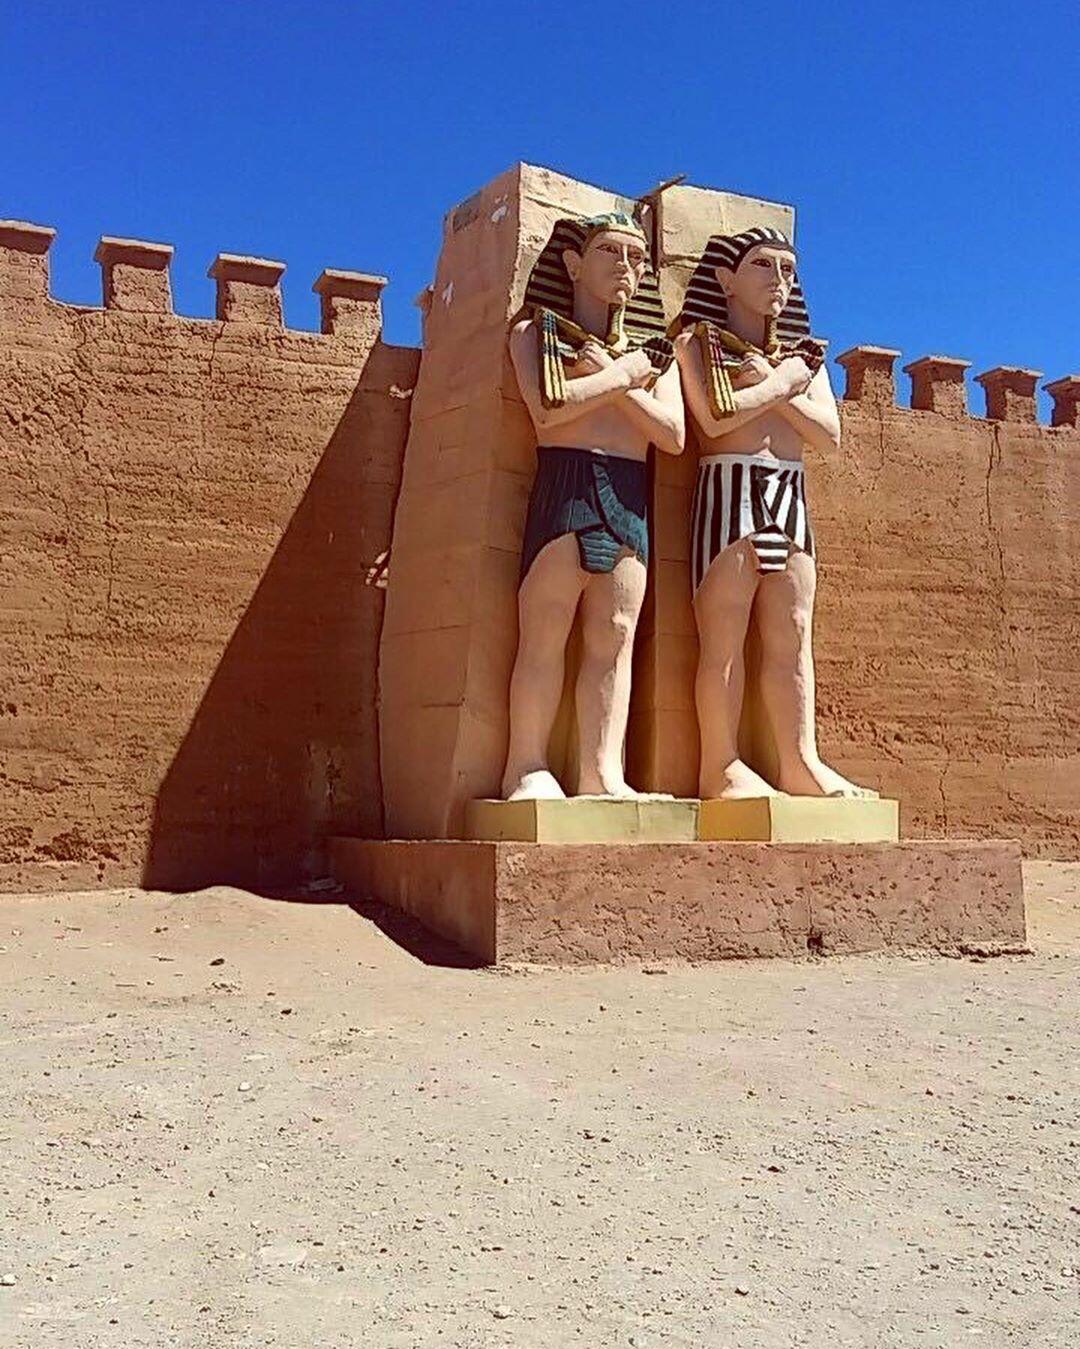 The statue of the atlas studios in Ouarzazate